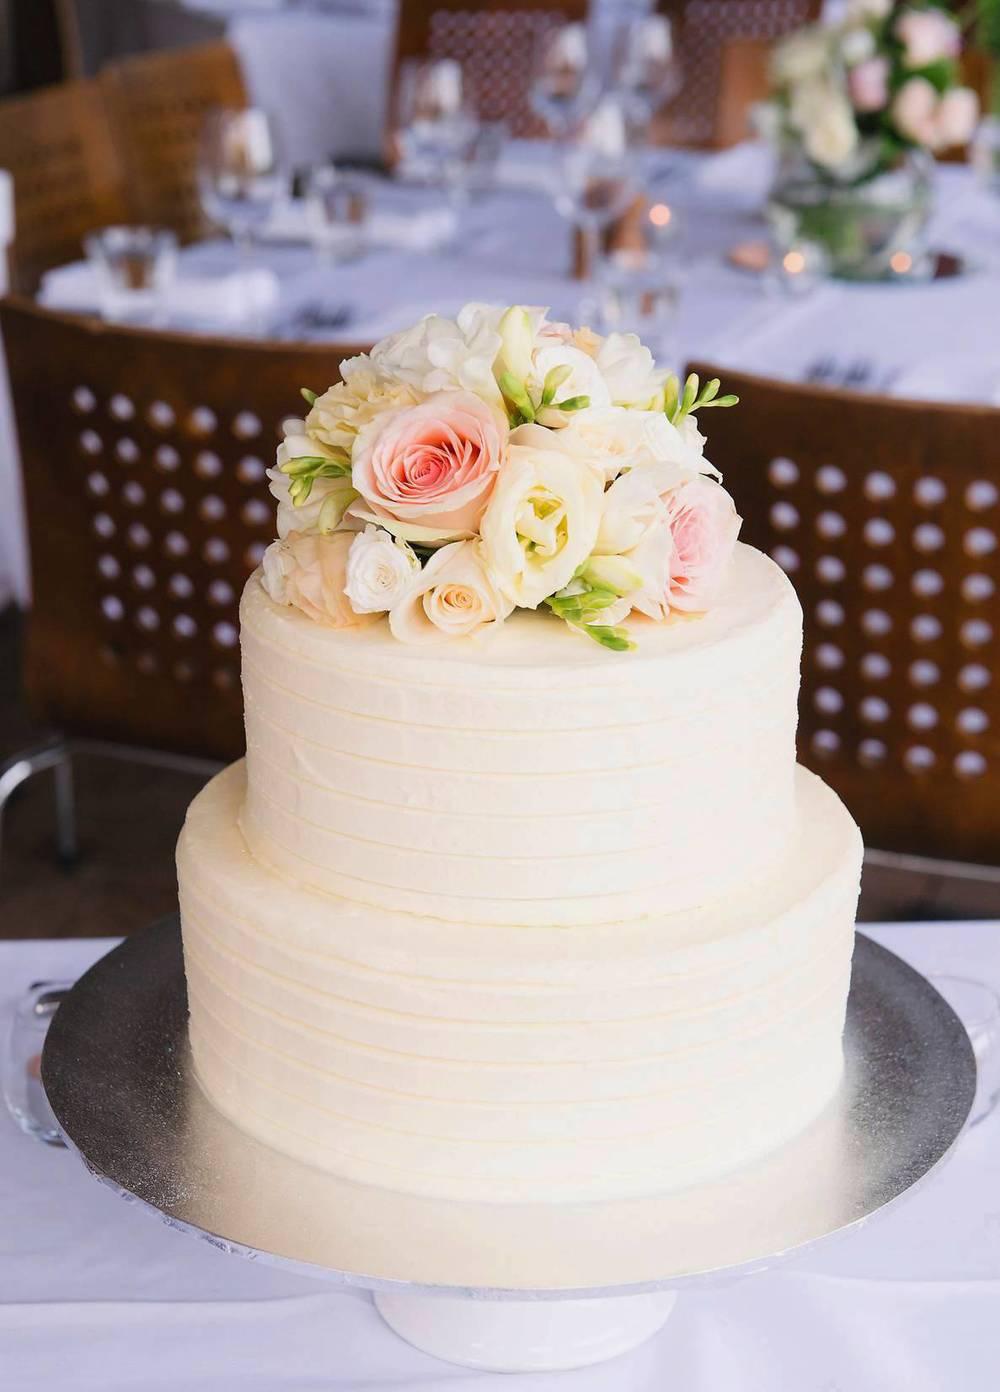 Vanilla Pod frosted Wedding Cake with fresh flowers.jpg